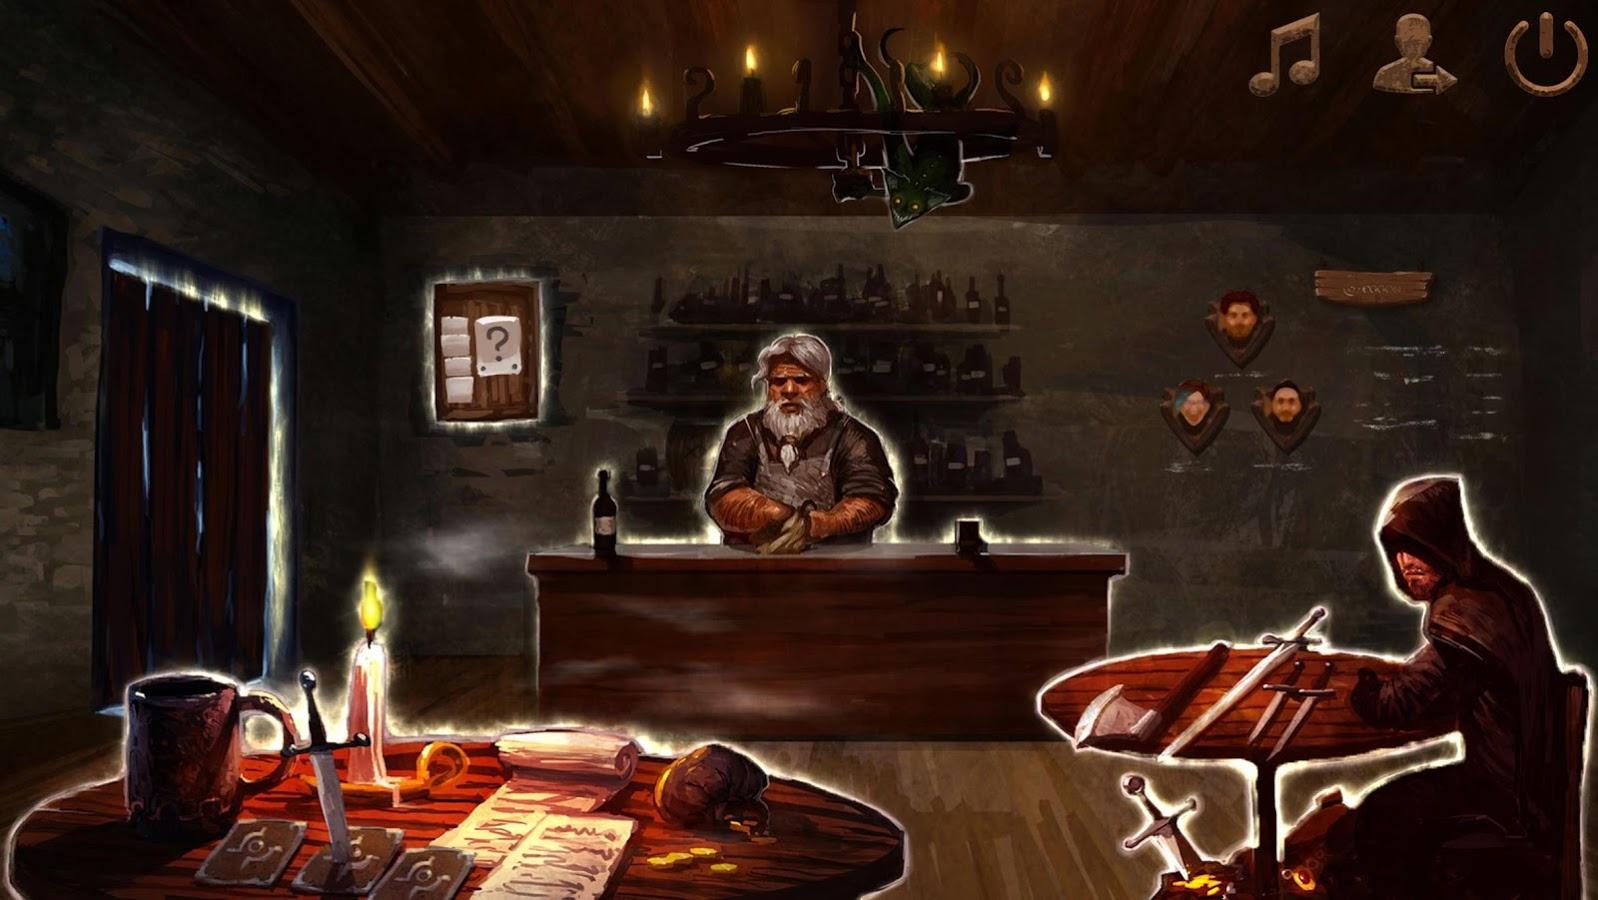 دانلود Lost in the Dungeon 4.0 - بازی نقش آفرینی